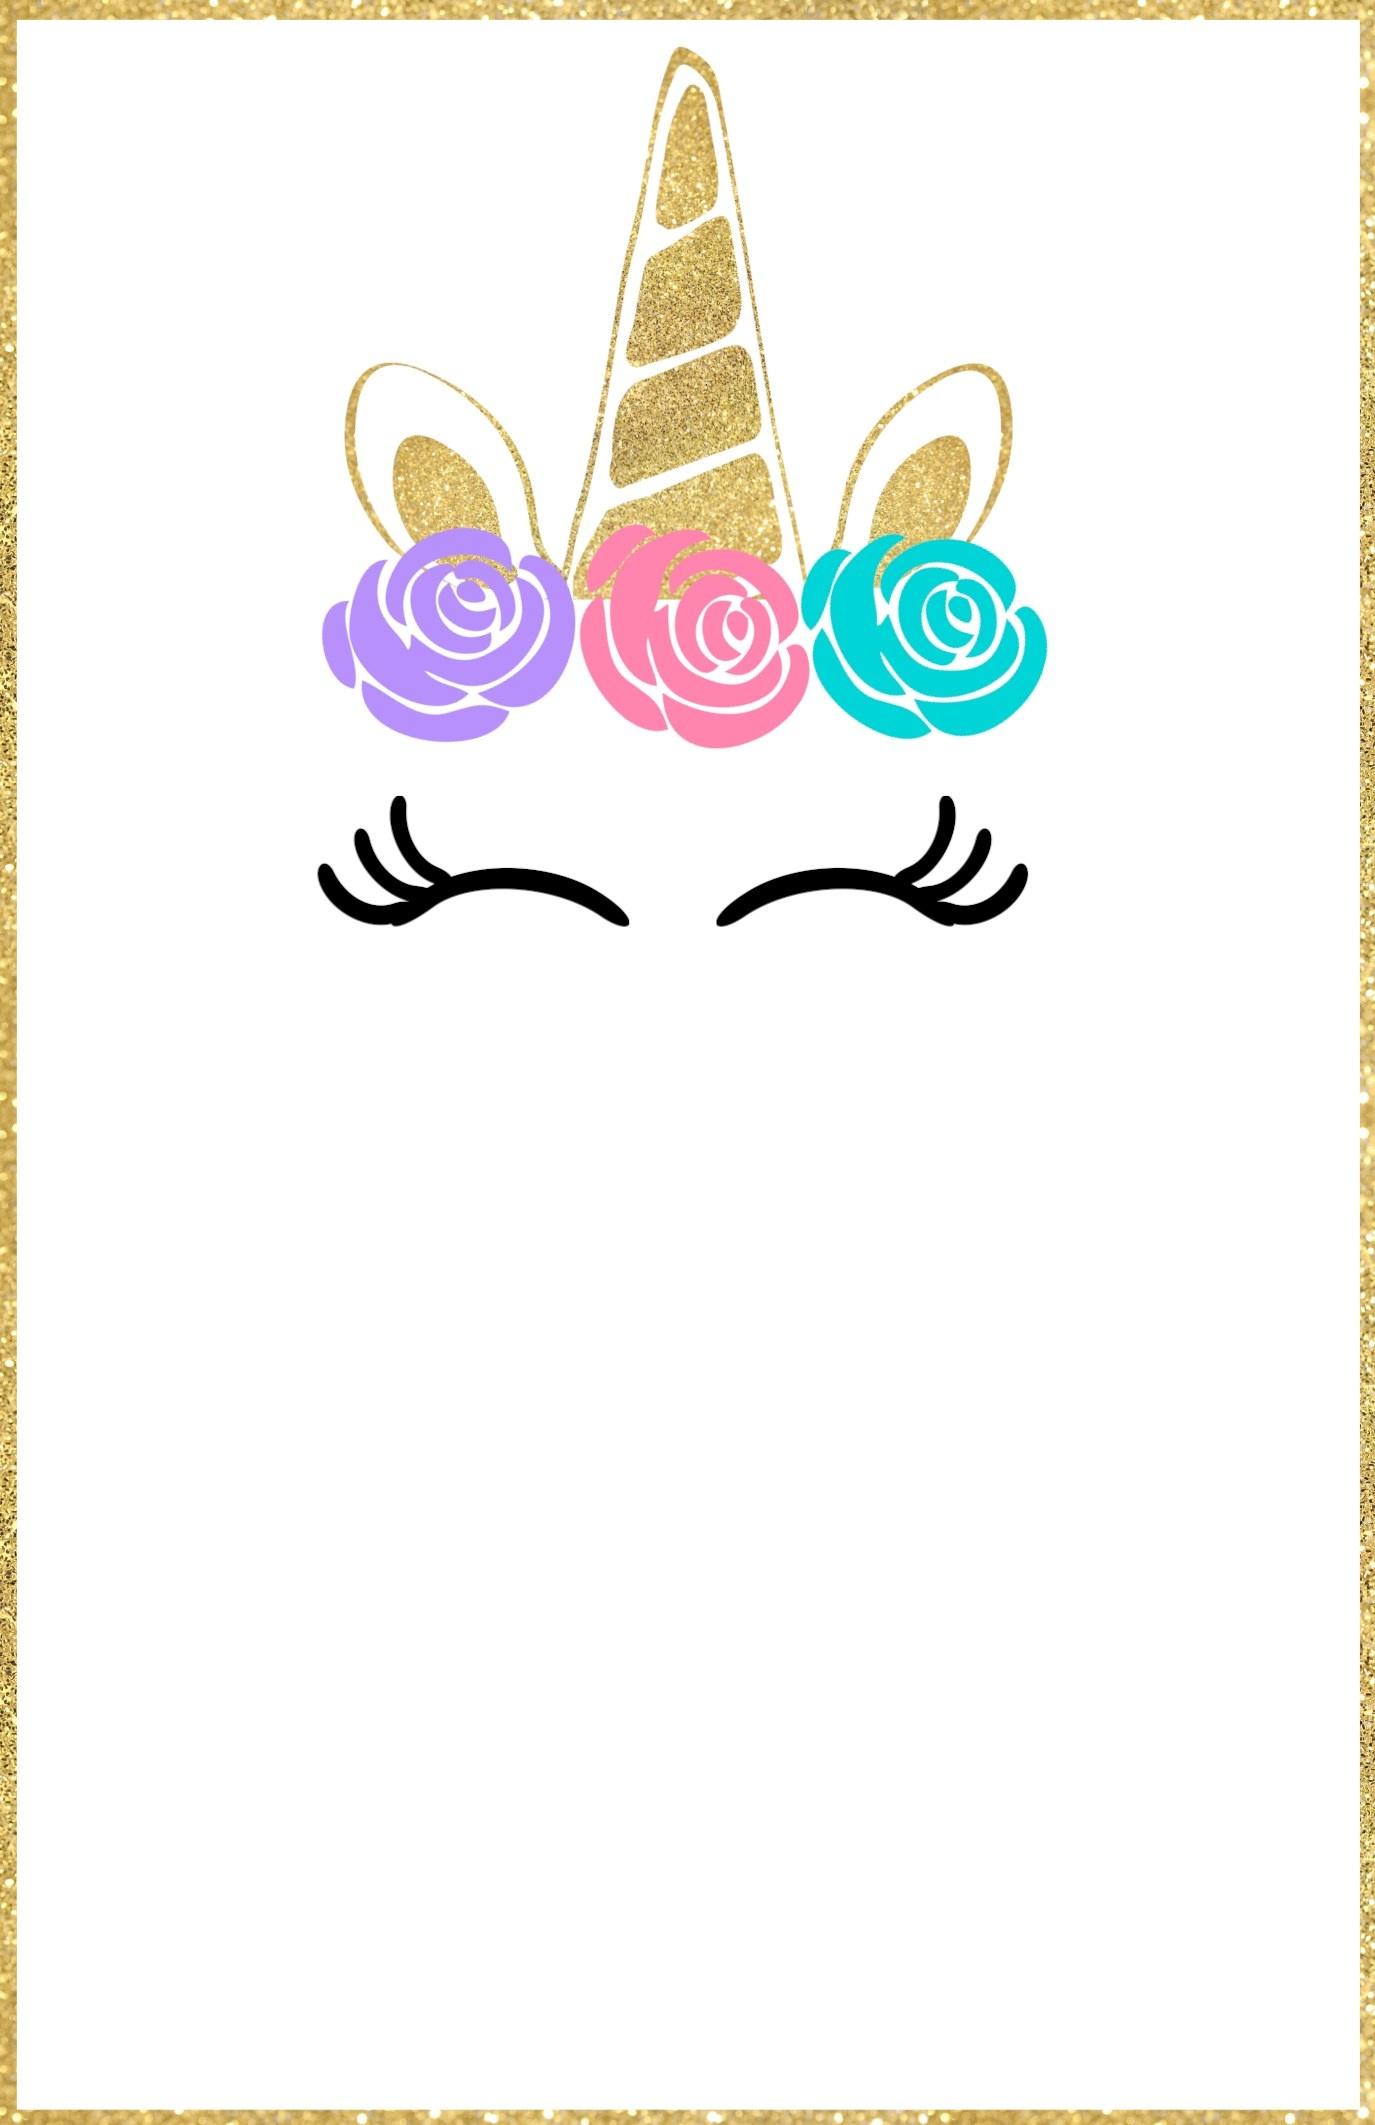 Free Printable Unicorn Invitations Template - Paper Trail Design - Free Printable Unicorn Birthday Invitations